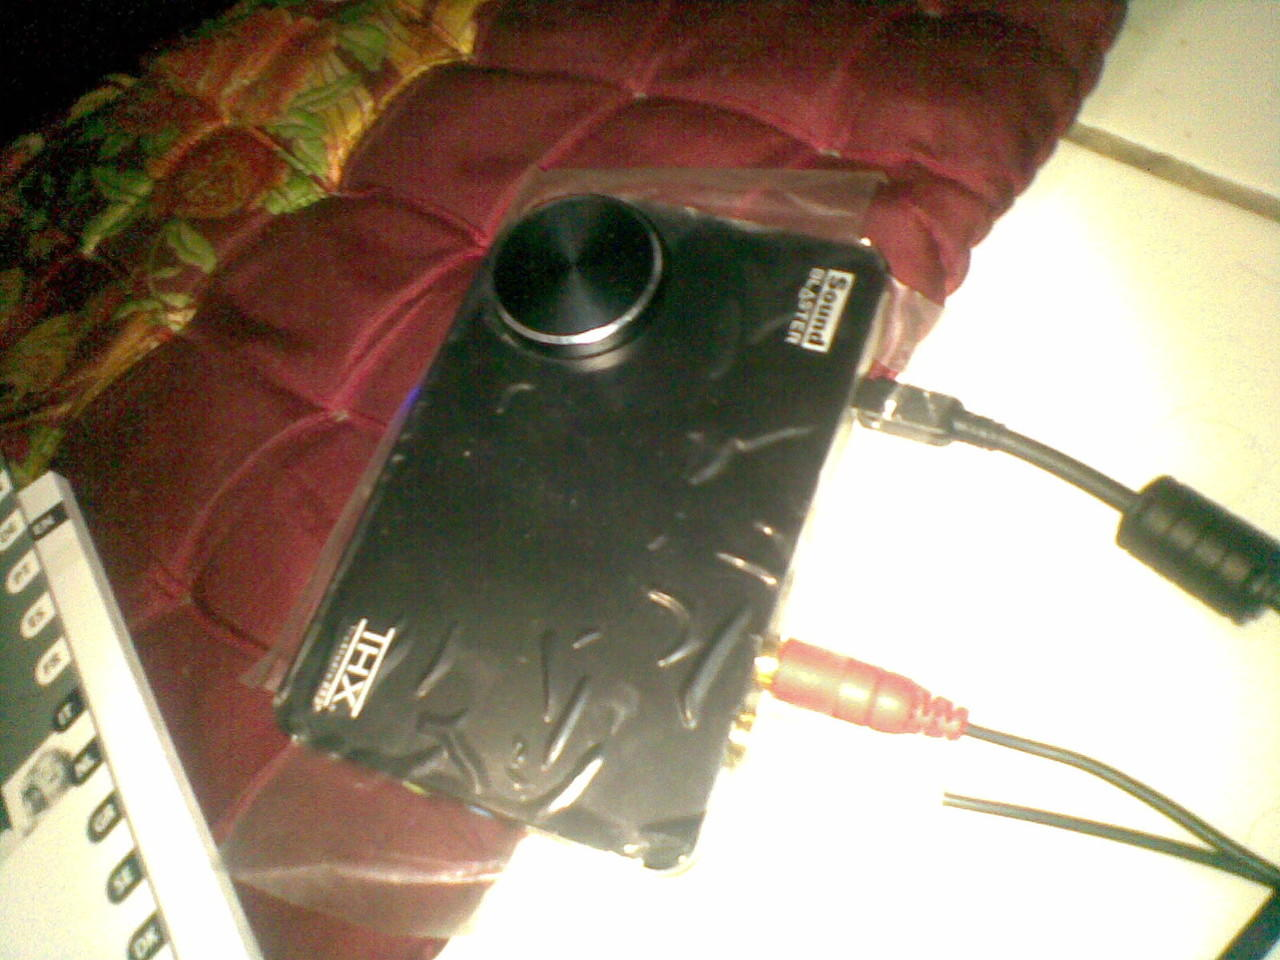 soundcard Sound Blaster X-Fi Surround 5.1